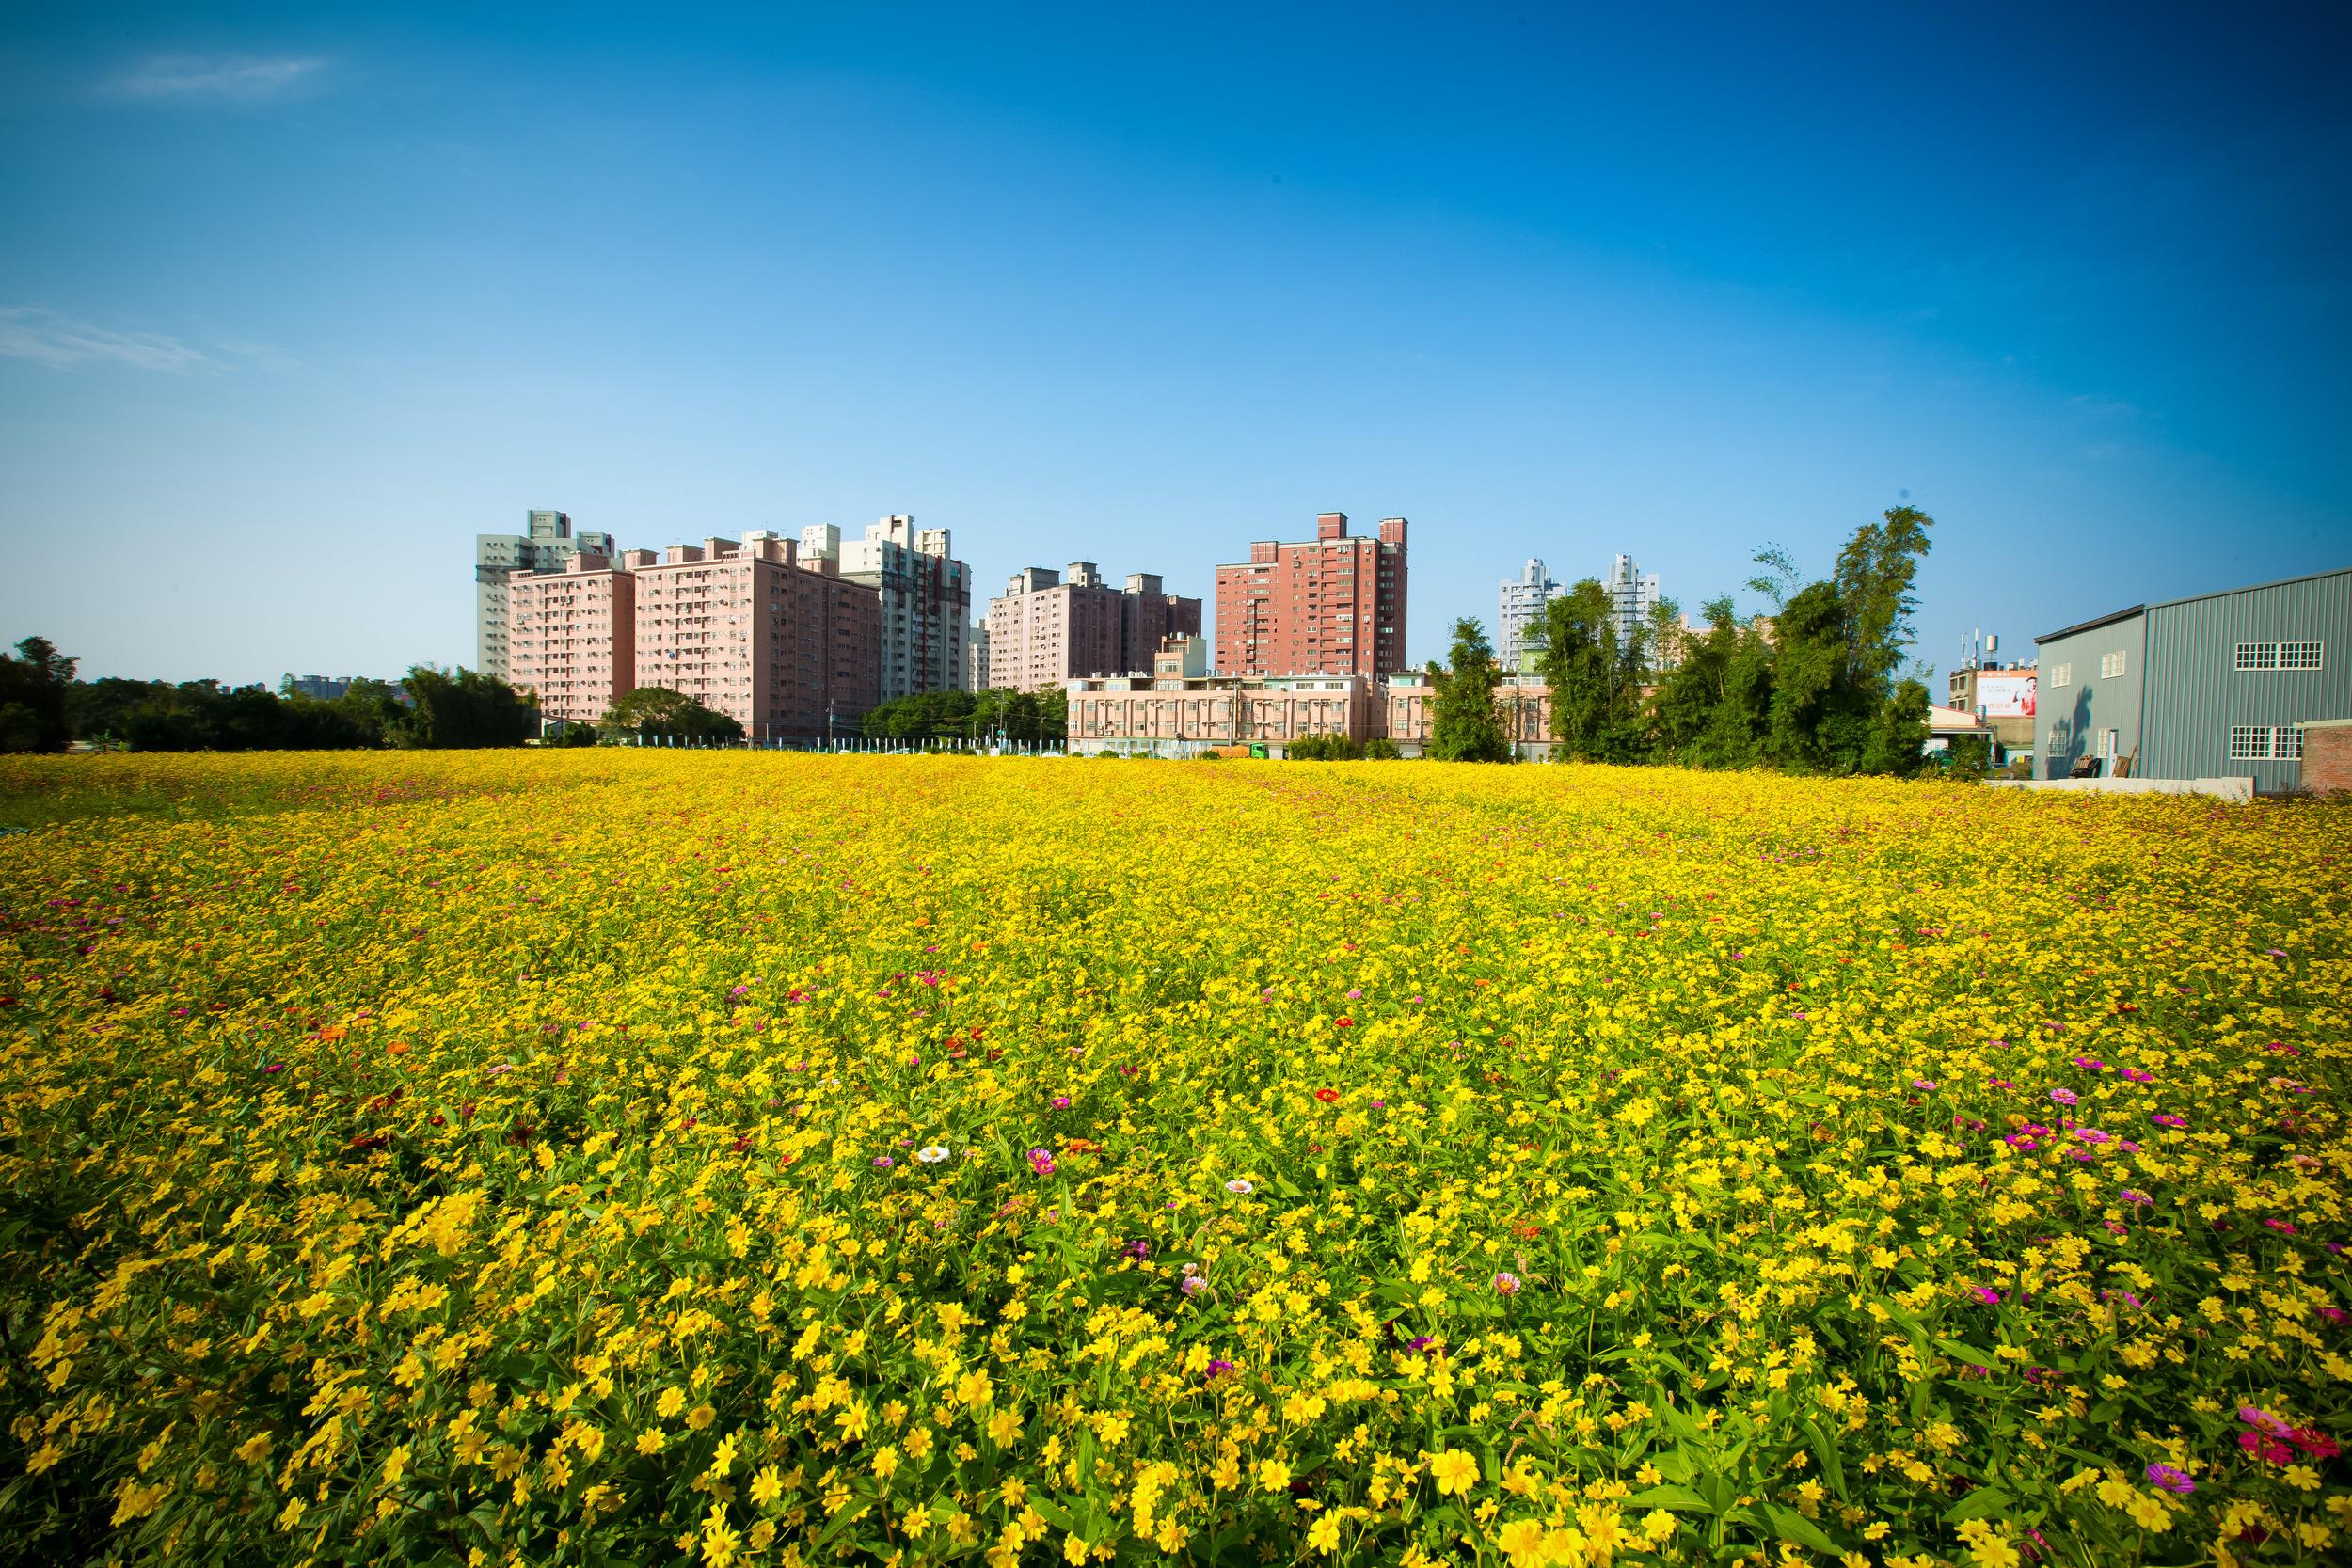 - A field of flowers near my home.